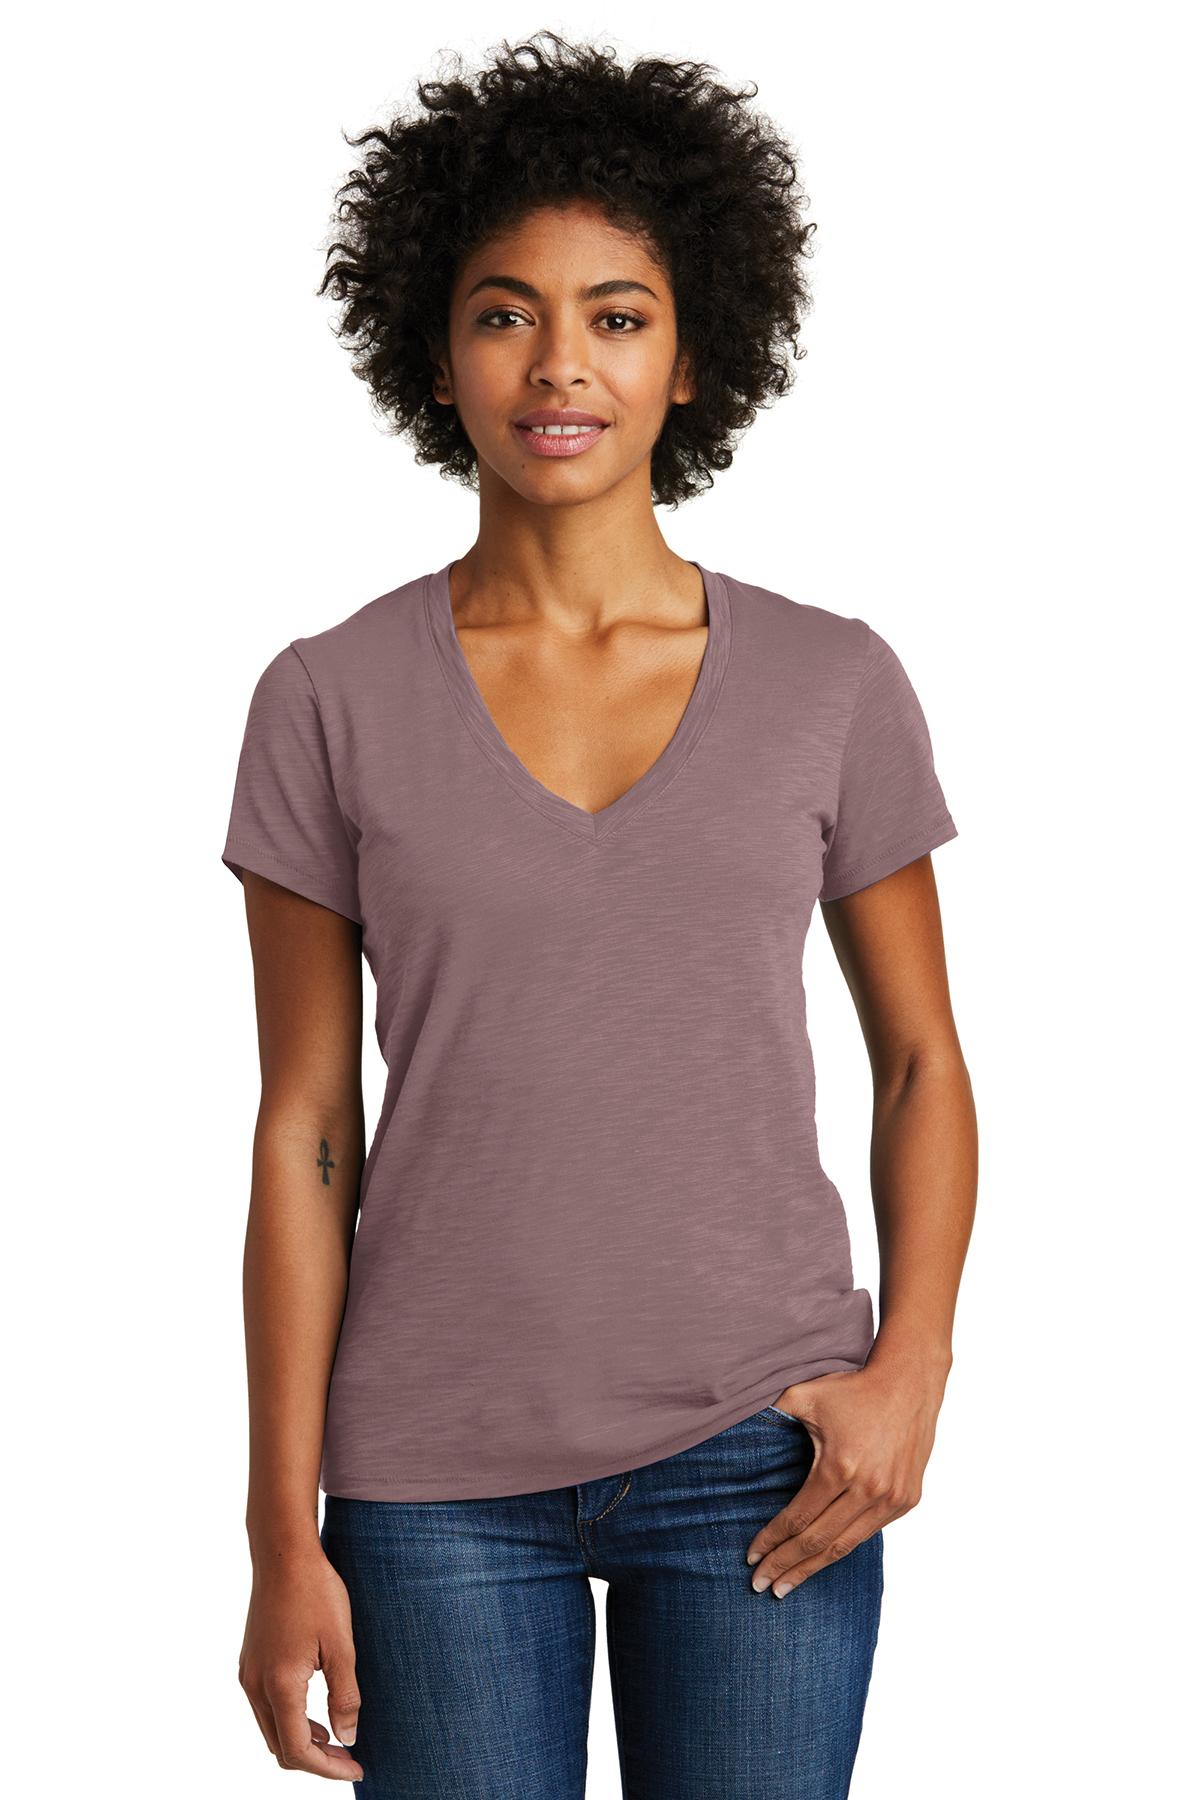 Alternative women 39 s weathered slub so low v neck tee for Low neck t shirts women s